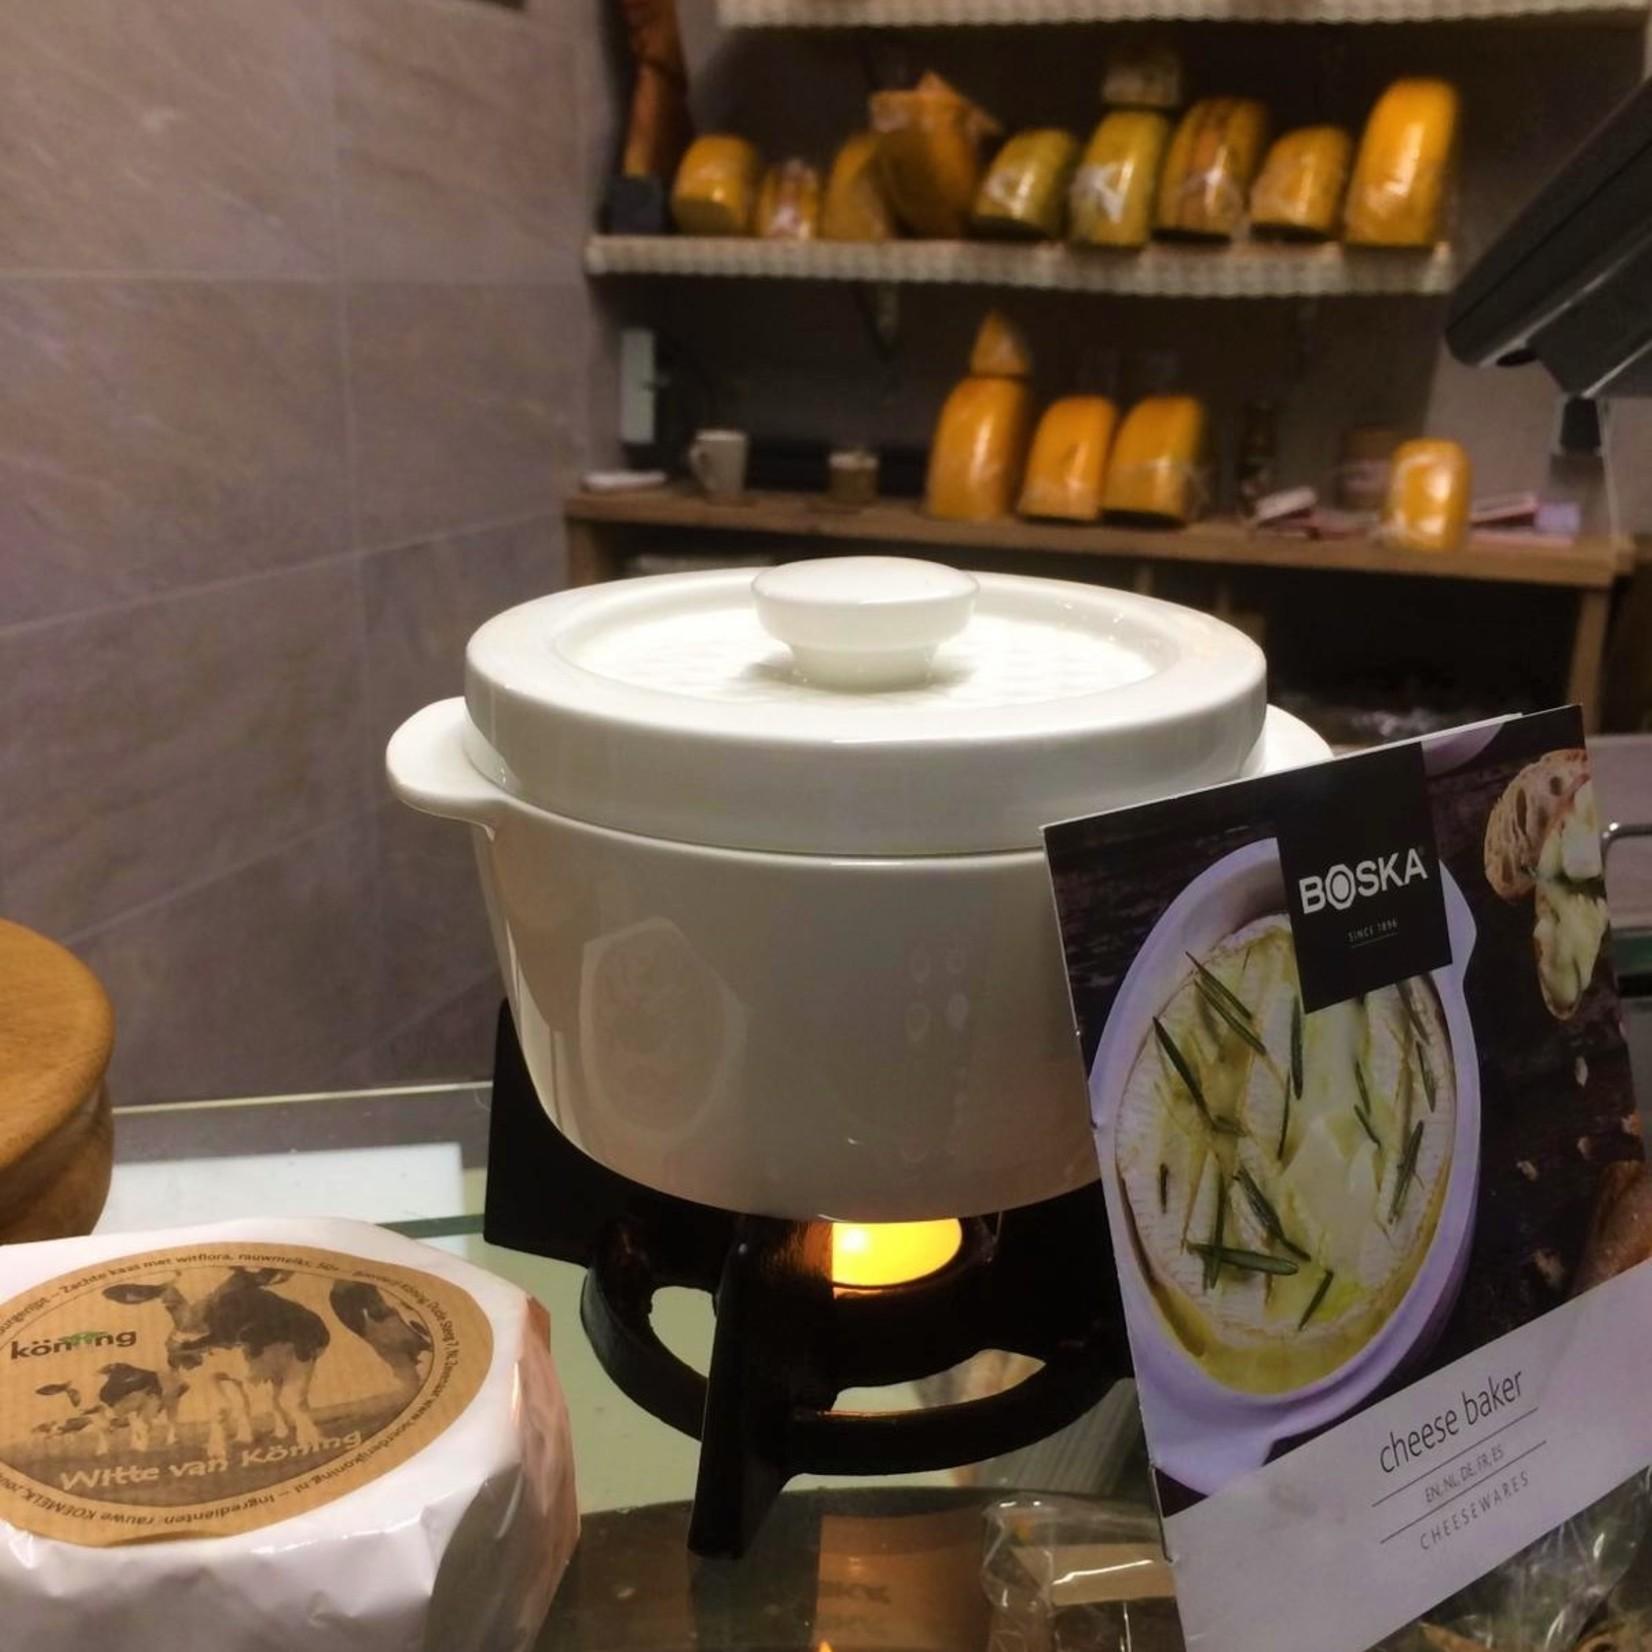 Kaas voor kaasfondue: de Witte van König